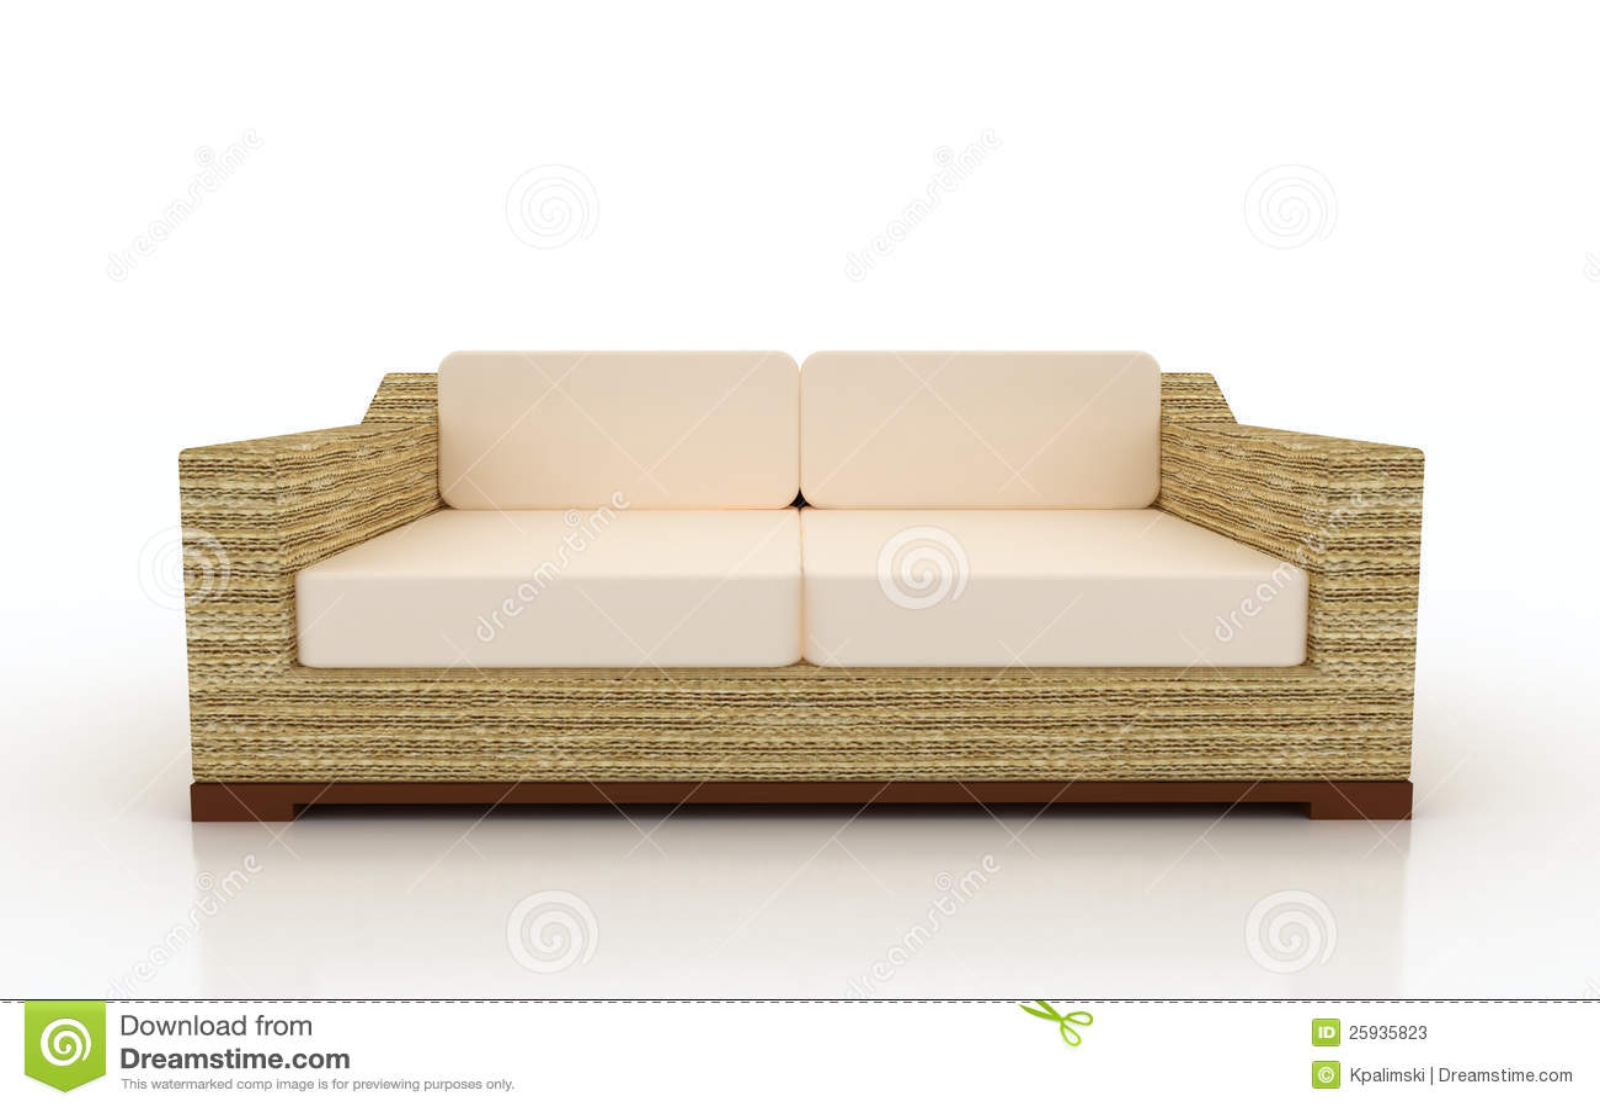 beach print sleeper sofas extra long for sale lounger sofa furniture stock illustration image